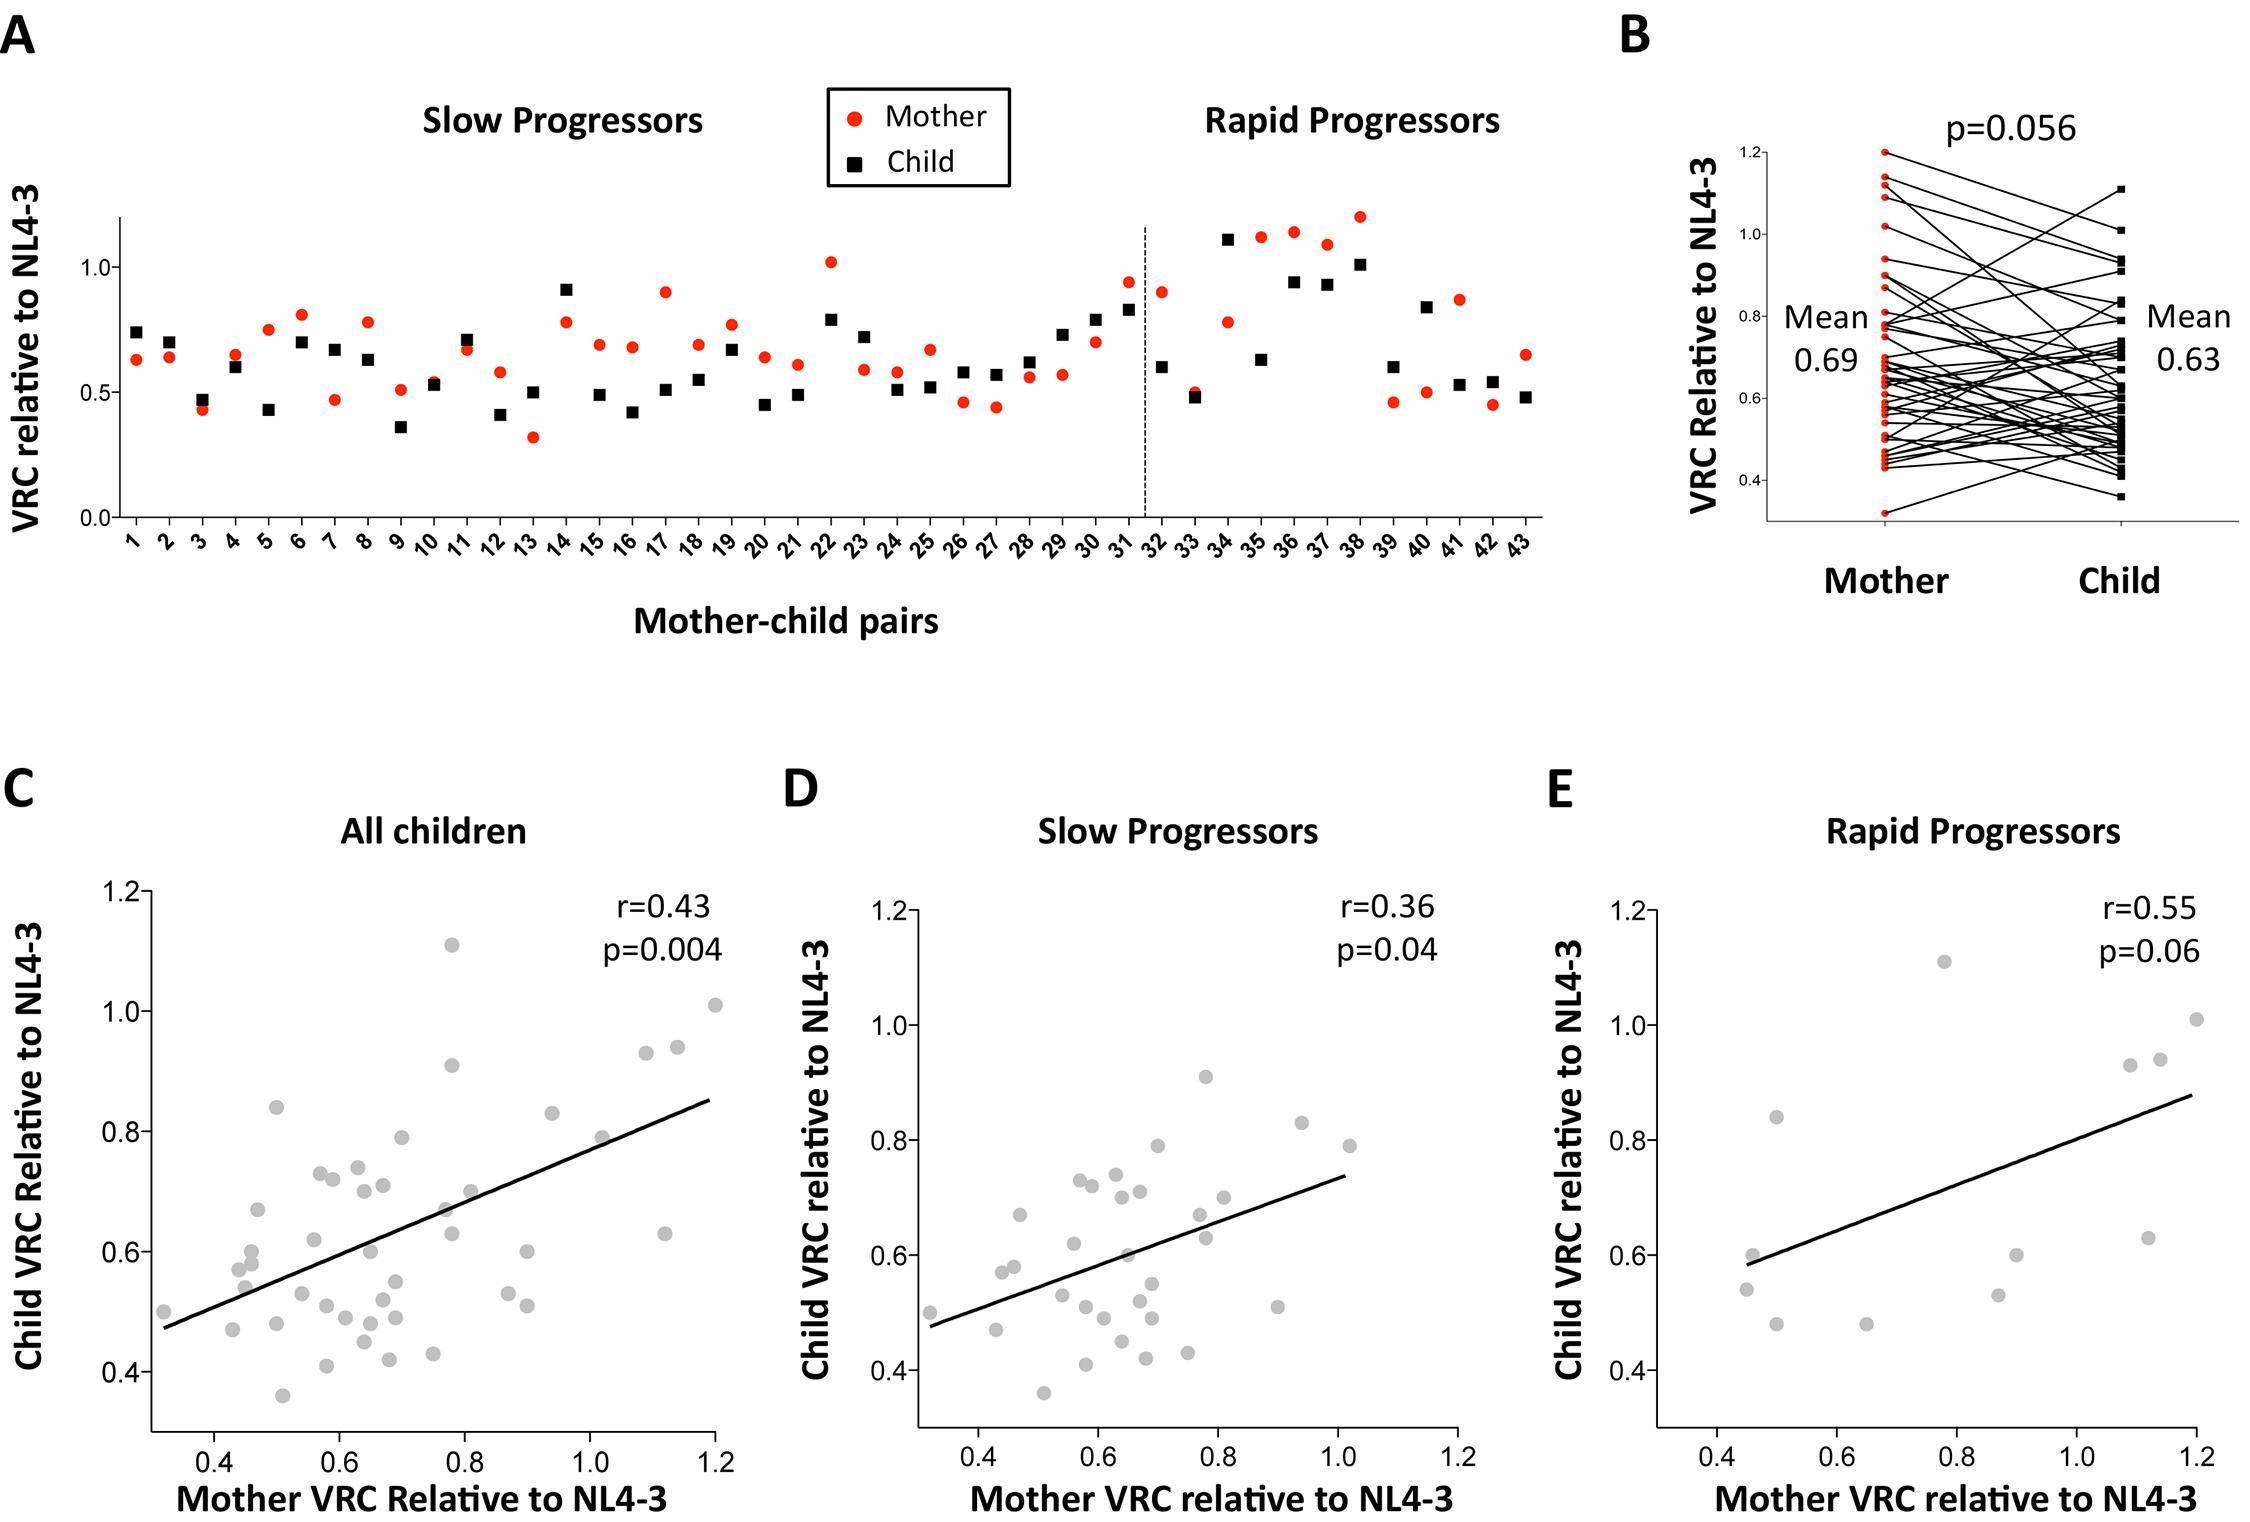 Relationship between maternal VRC and pediatric VRC.